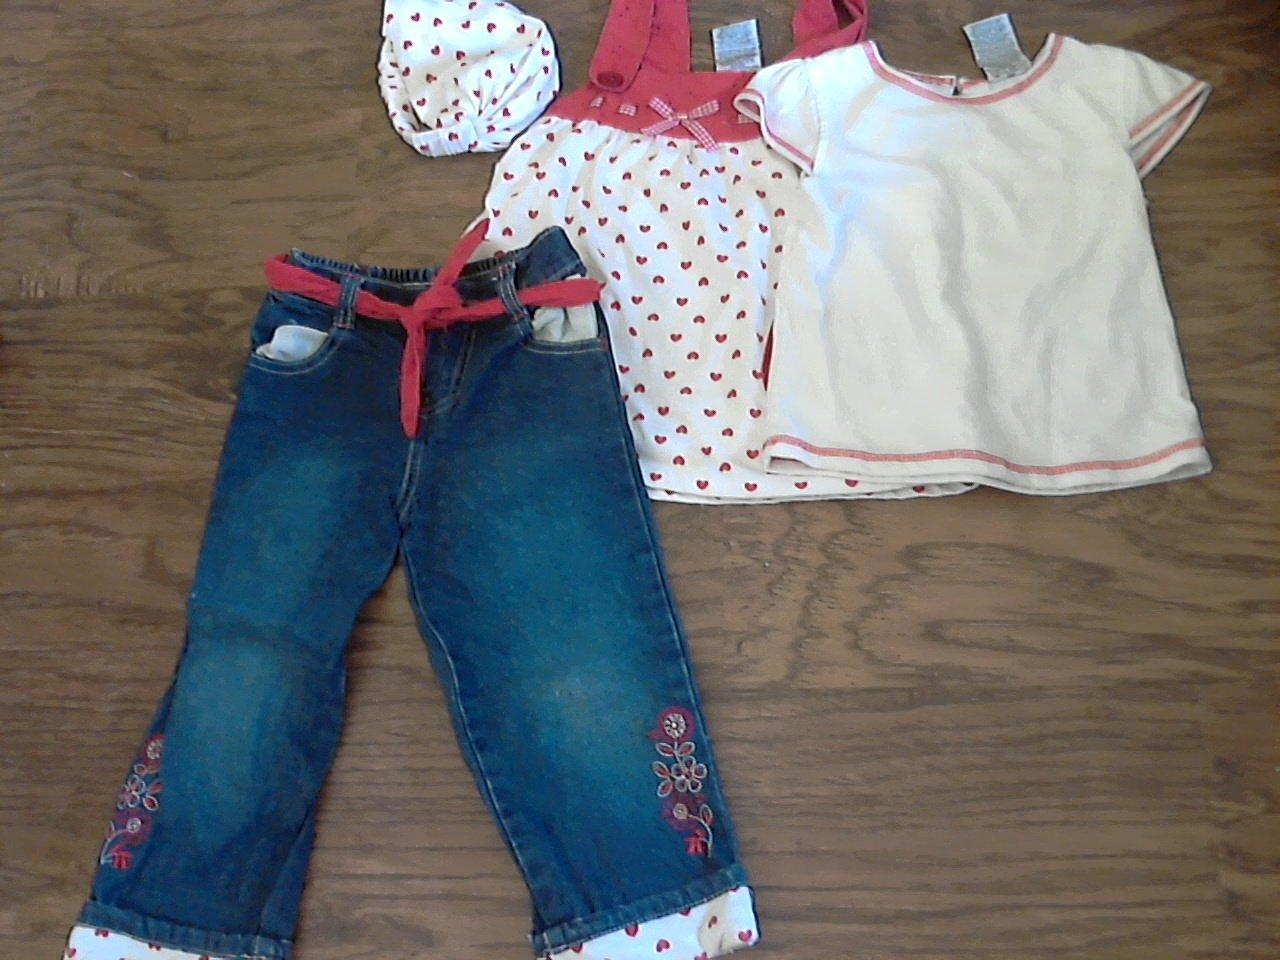 4 pieces toddler girl's white shirts, cap, jean denim pant set 3T